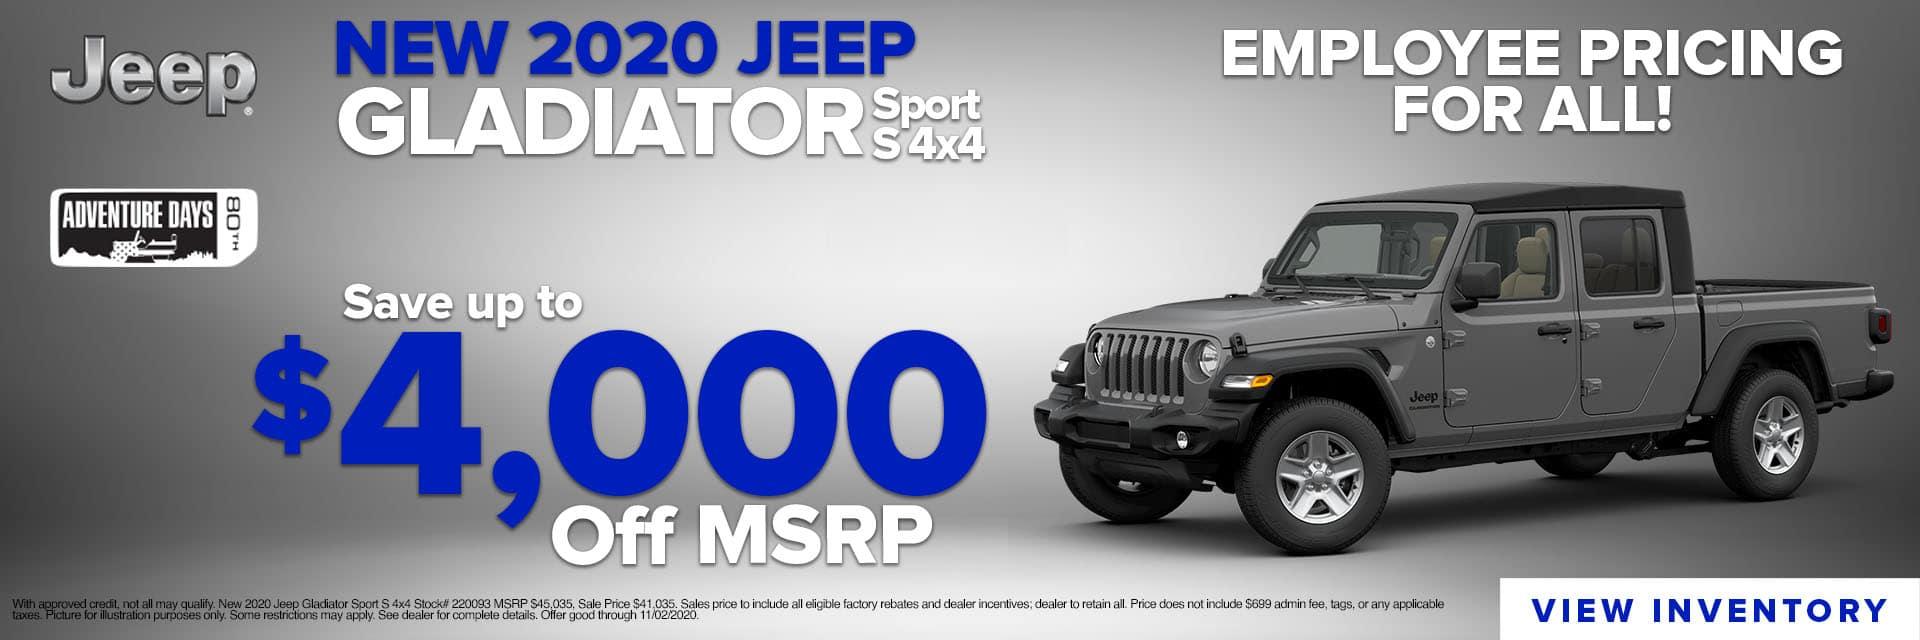 CLGO-October 2020-2020 Jeep Gladiator Inspire Slider UPDATED